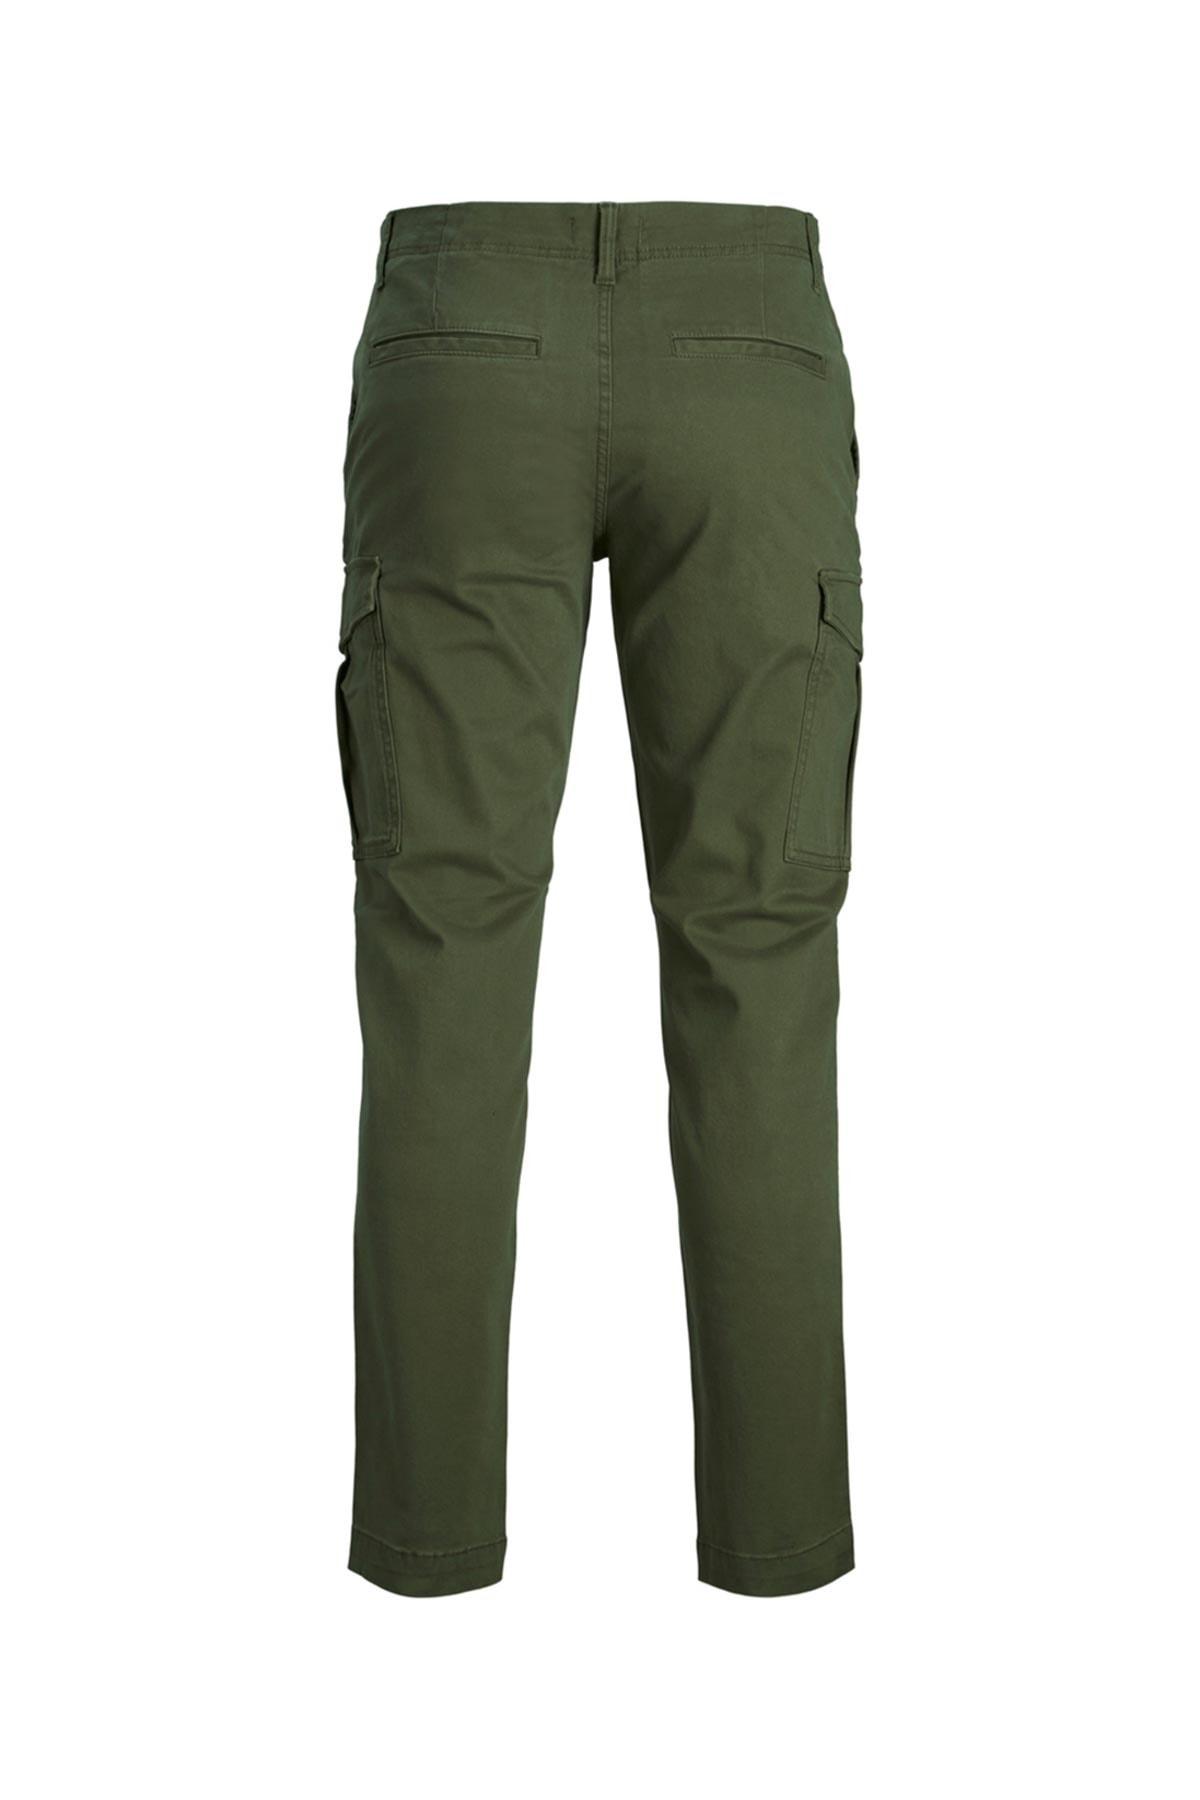 Jack & Jones Erkek Kargo Pantolon 12174184 2